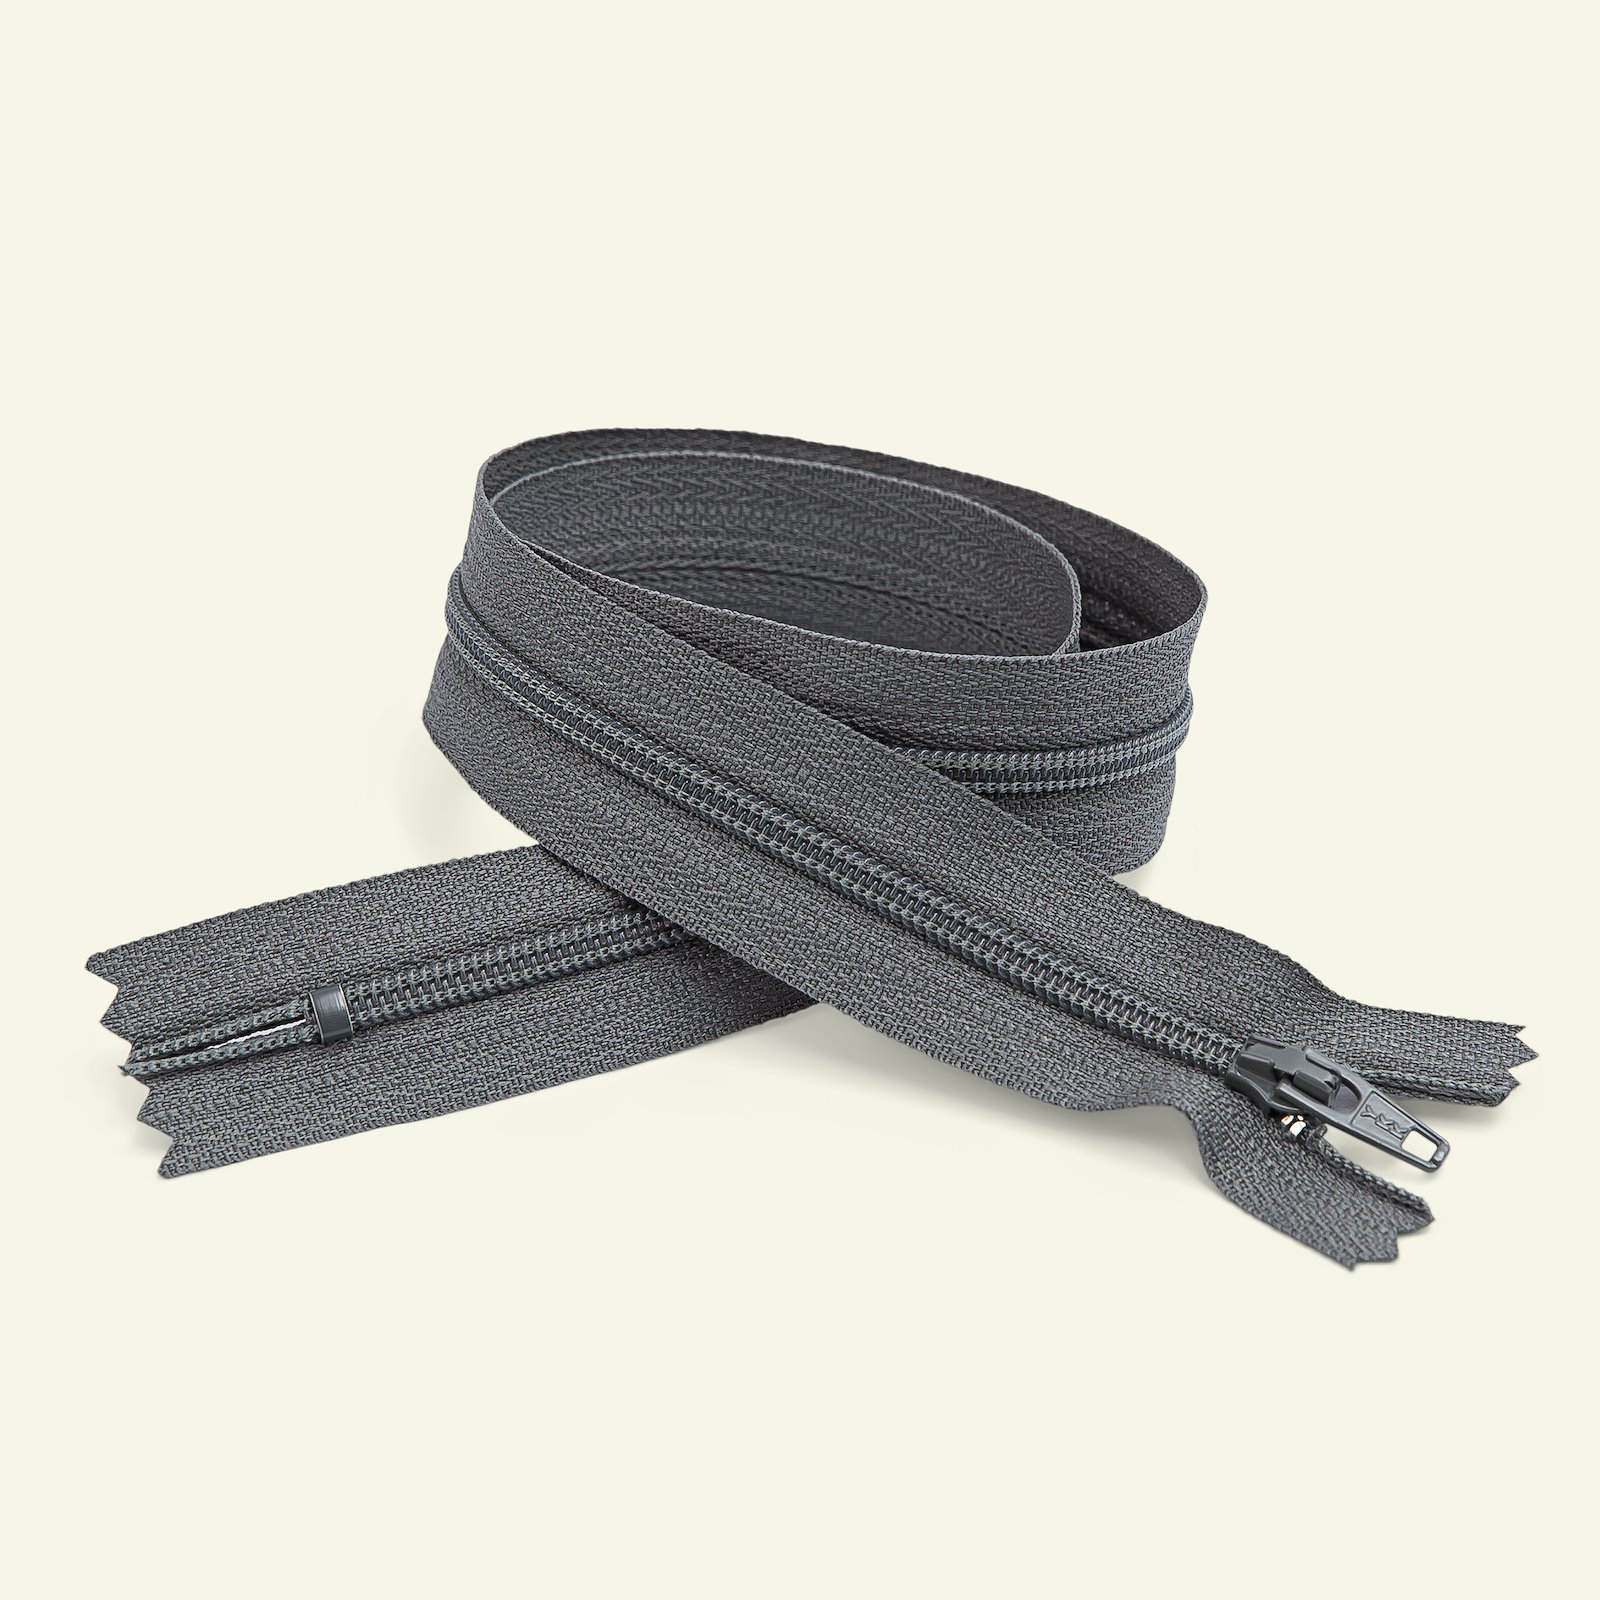 YKK zip 4mm closed end 20cm grey x40541_pack